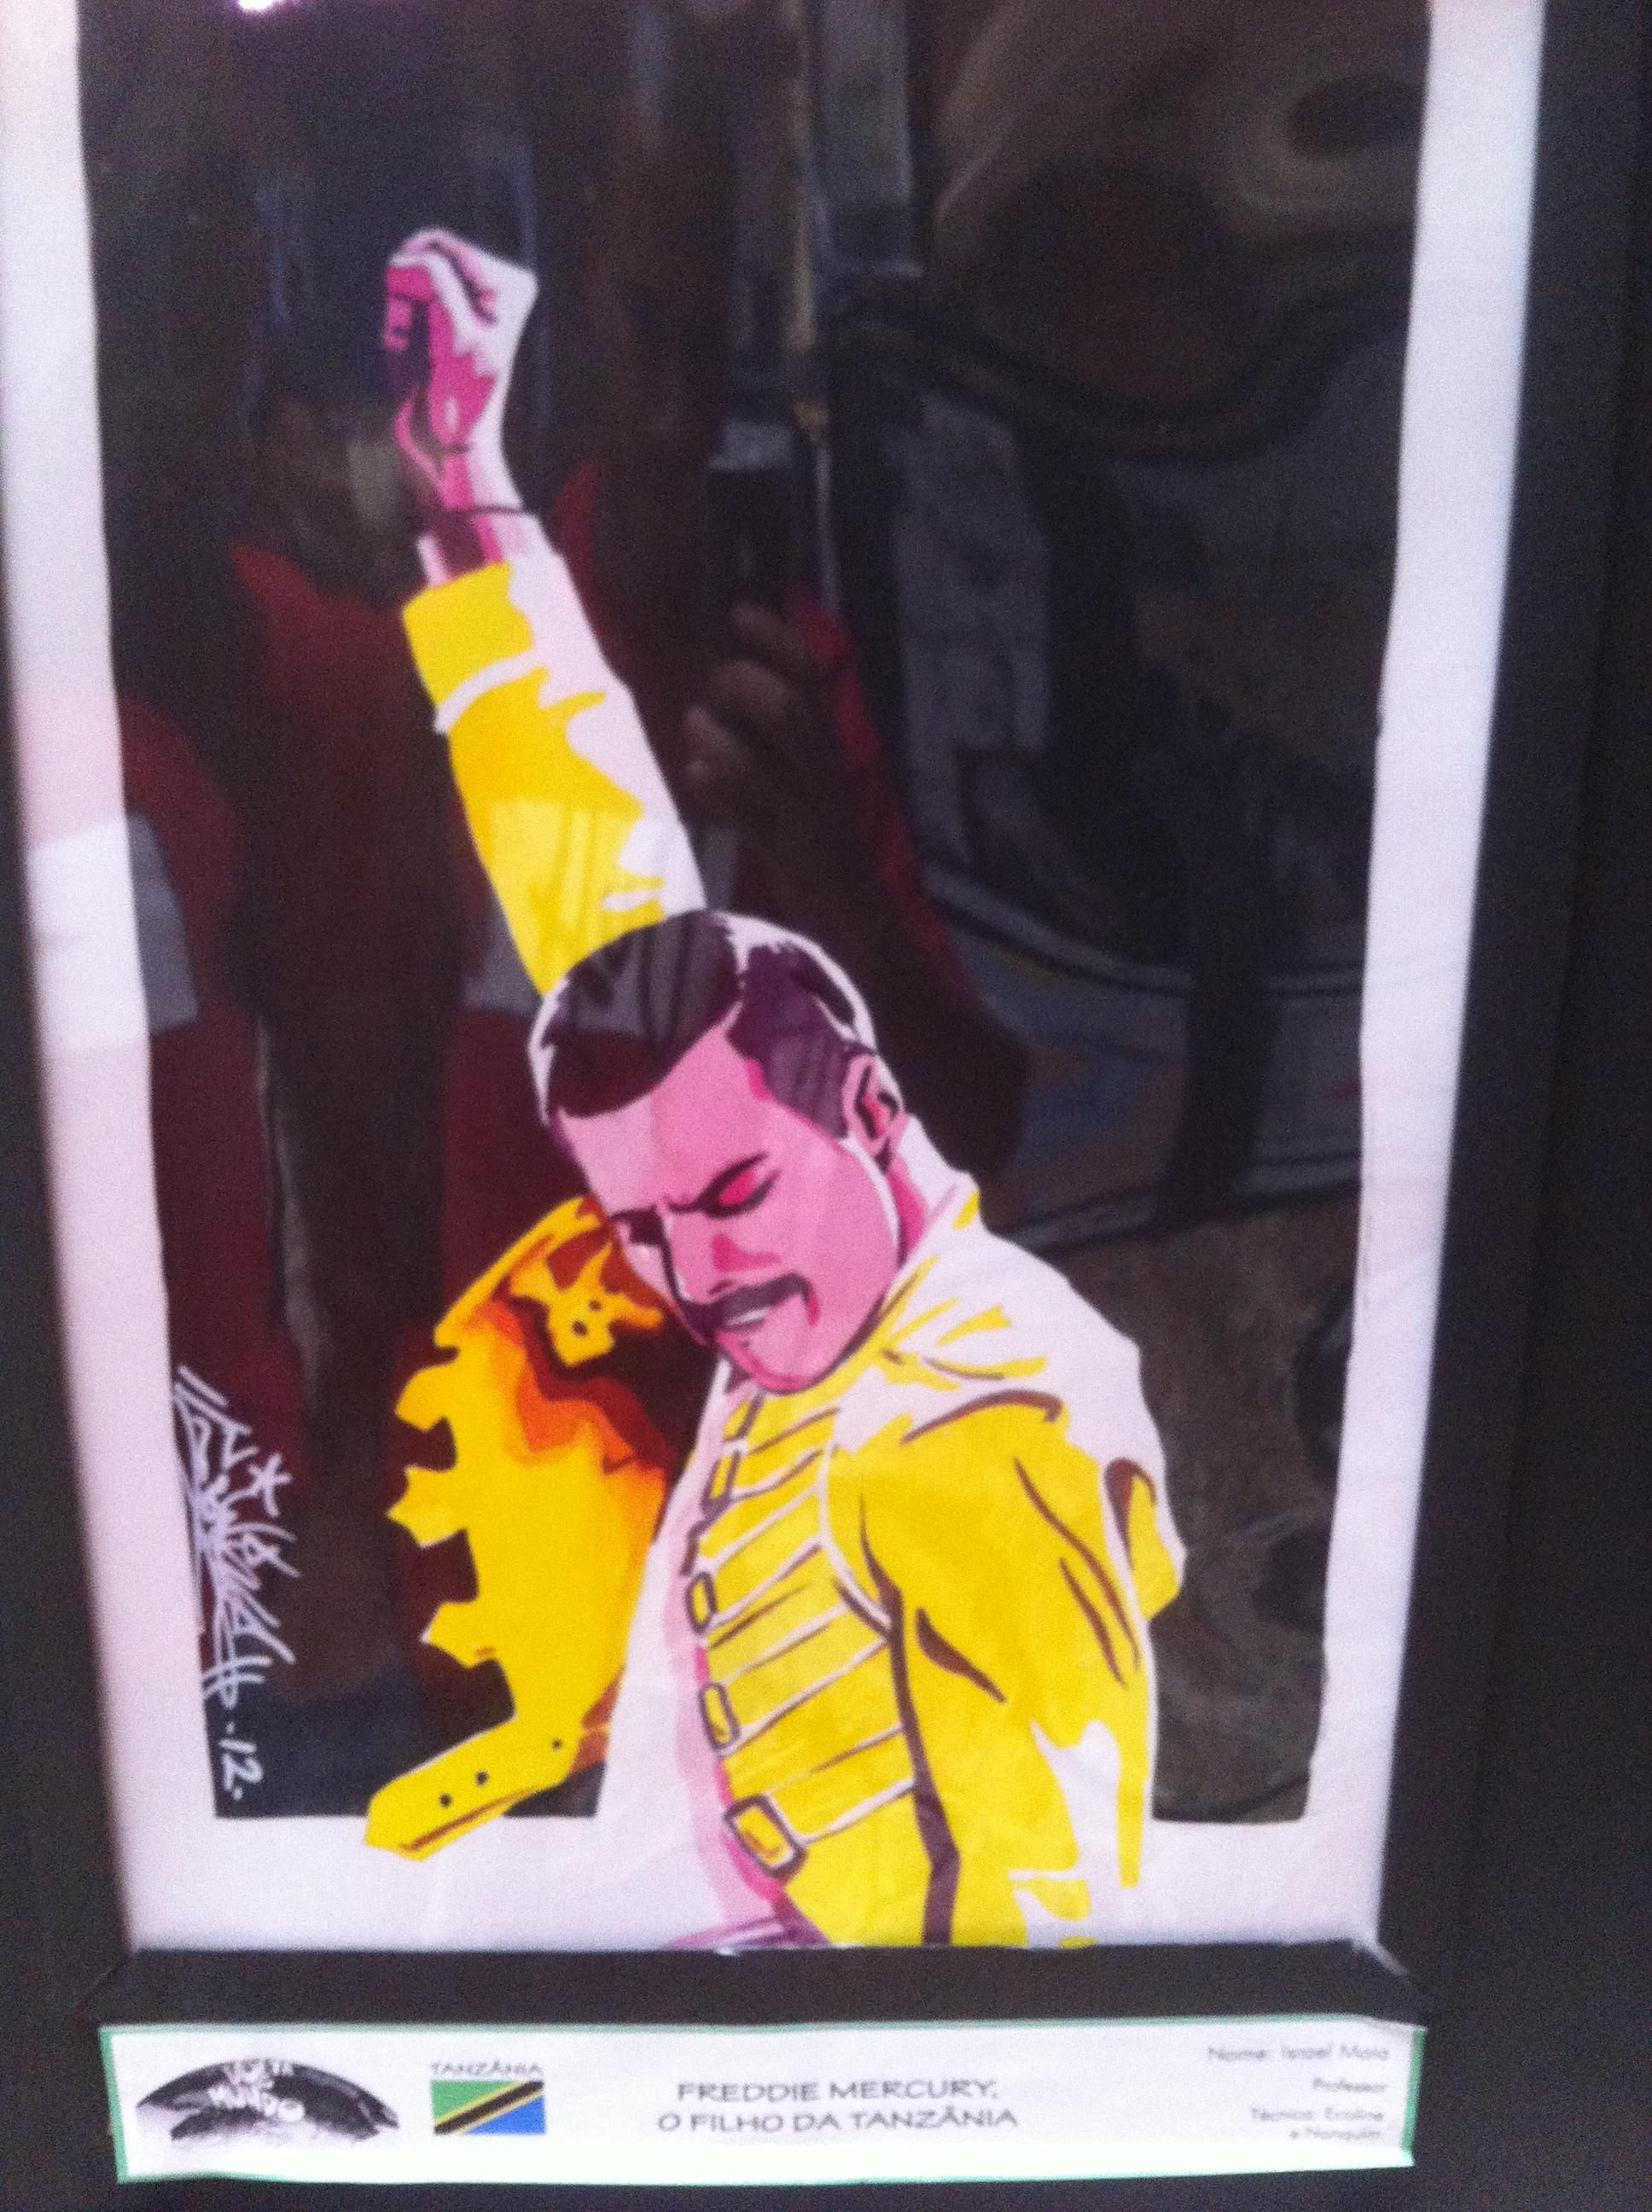 Pintura do Freddie Mercury